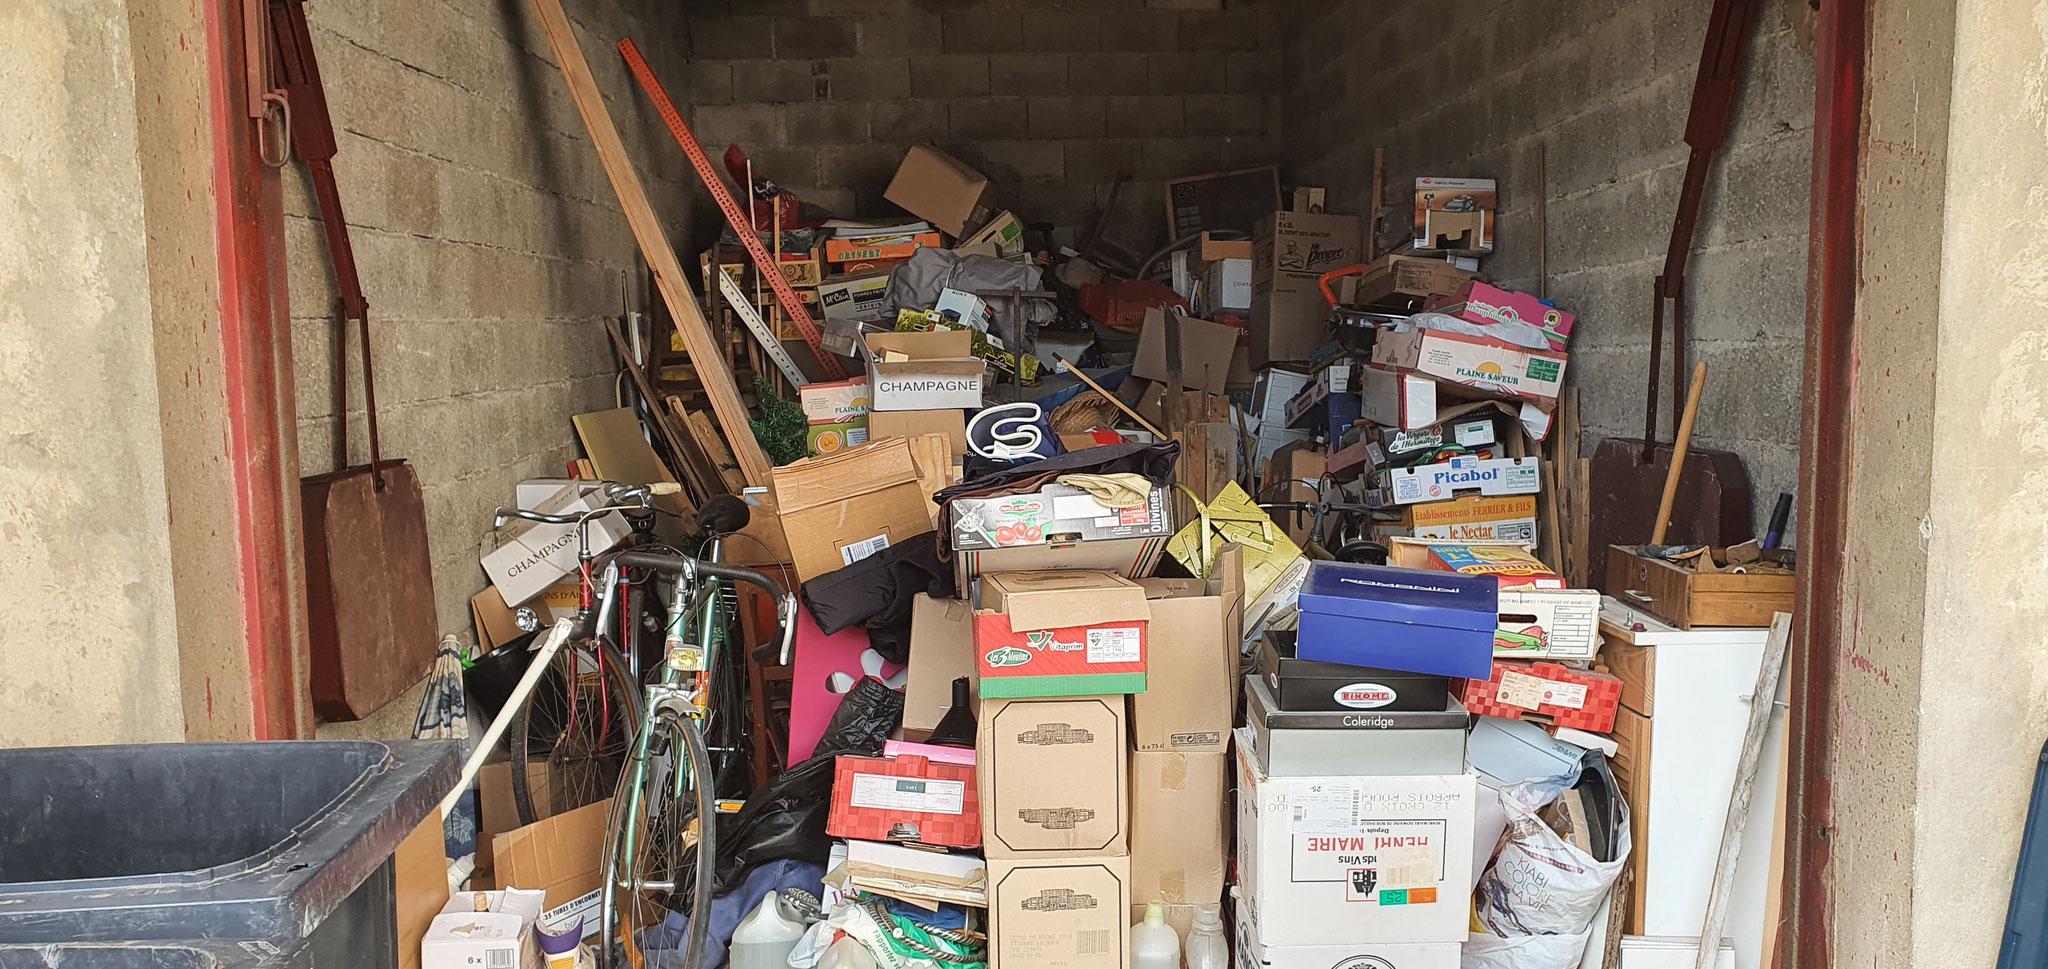 Débarras d'un garage à Pontarlier 25300 - Doubs- débarras AHLEN Clément